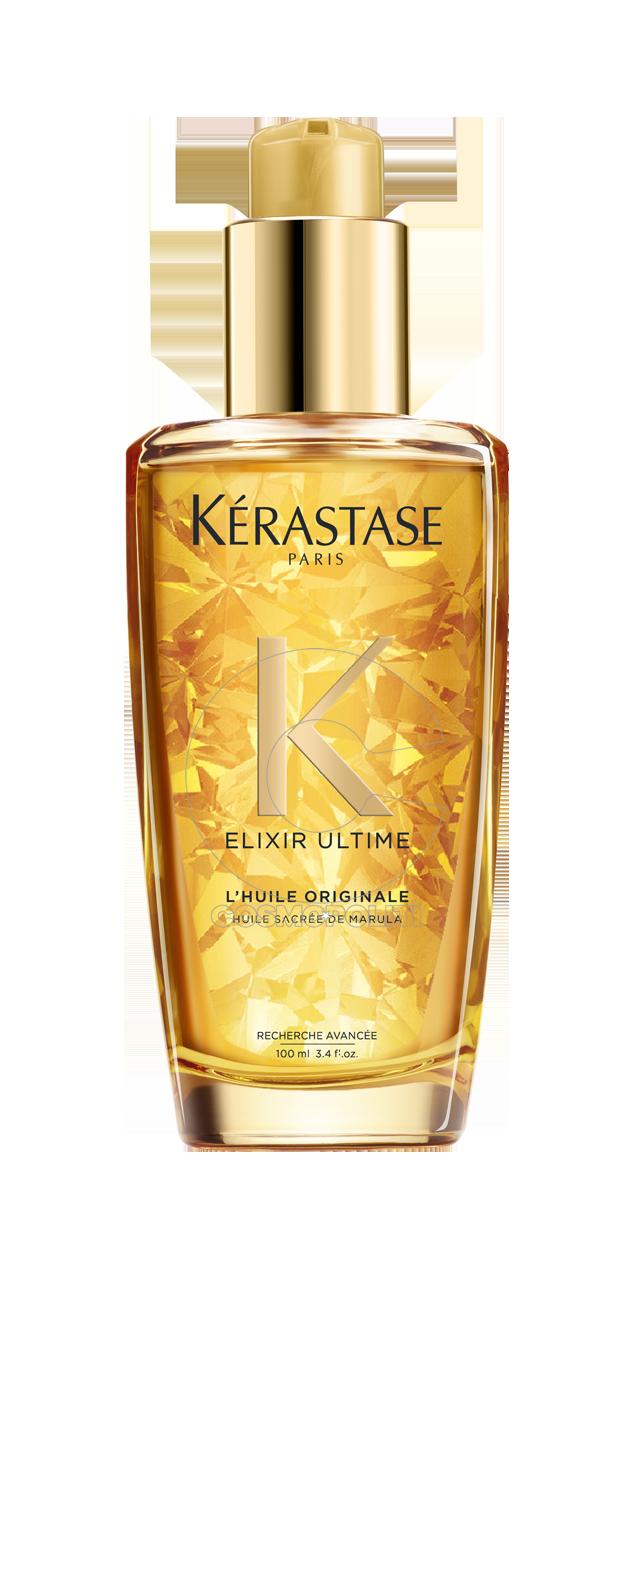 KERASTASE - Elixir Huile Originale EC1 201